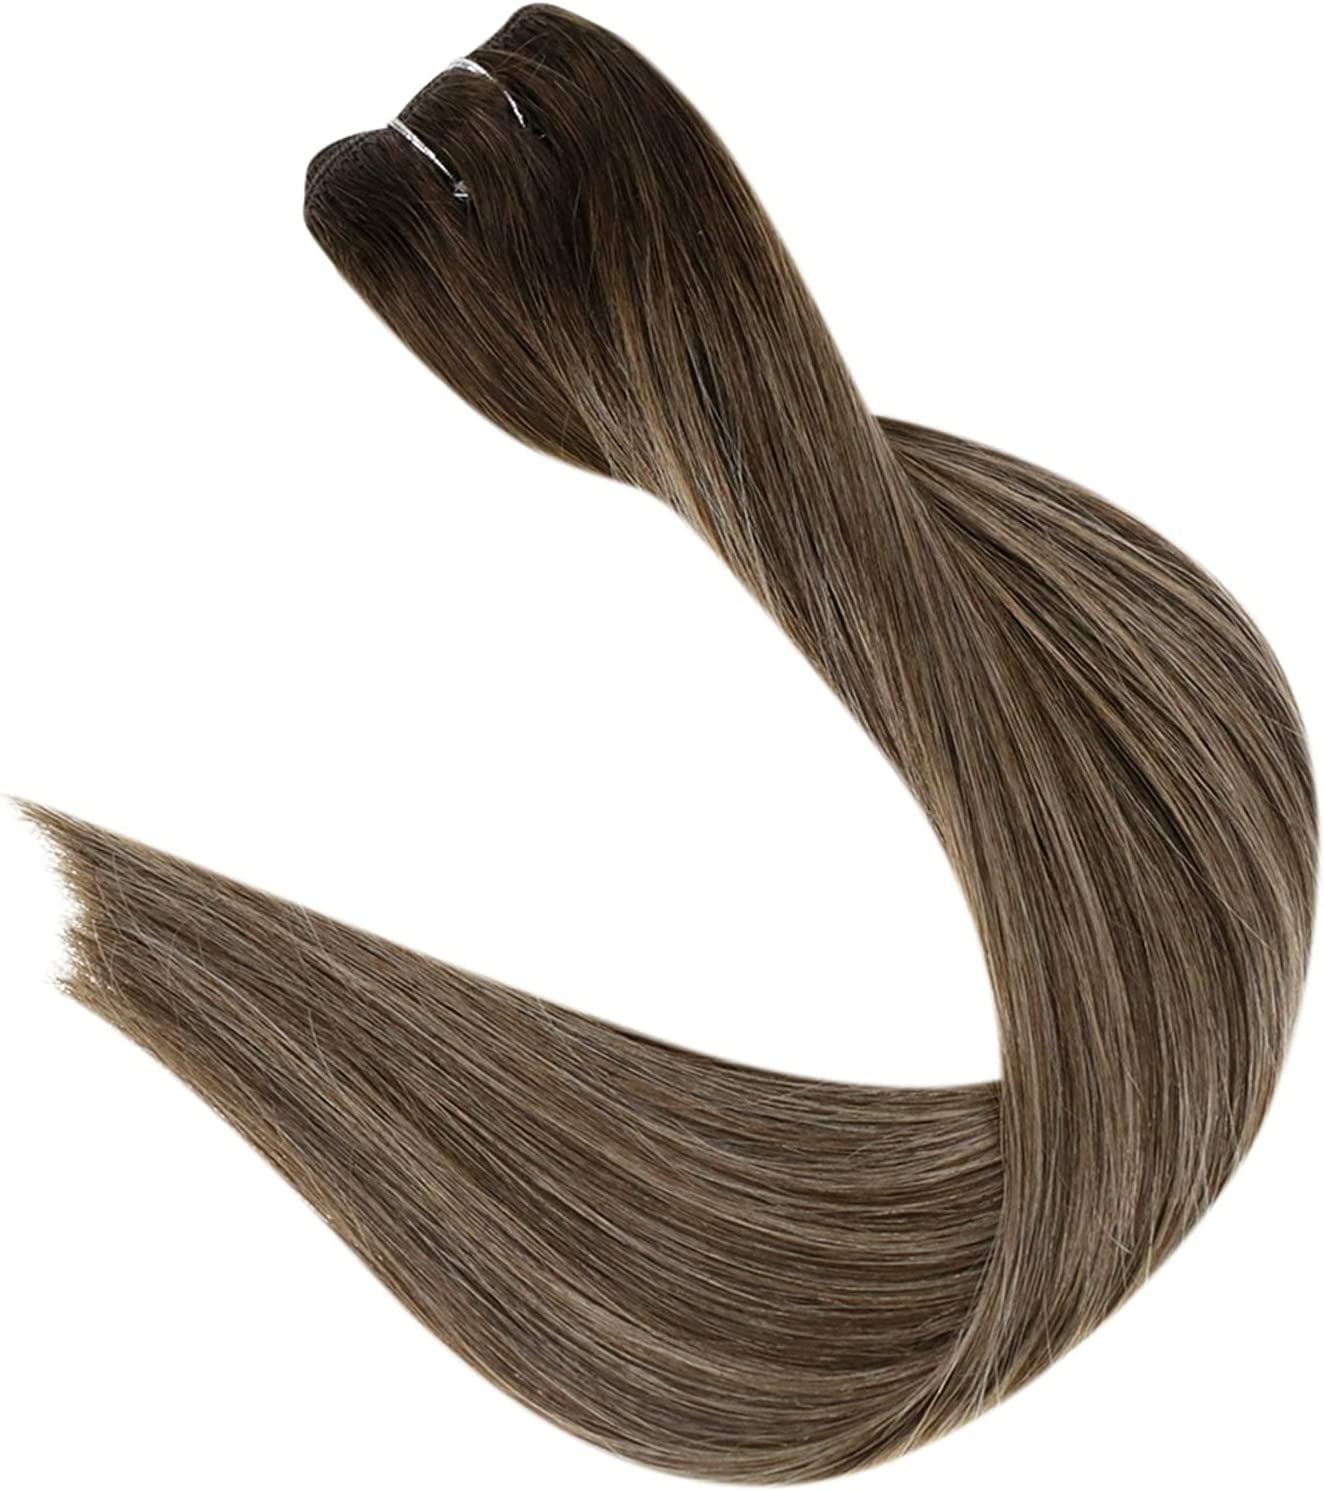 BYOLPMKK Hair Extension Weft Invisible Max 80% OFF C El Paso Mall Bundles Ombre